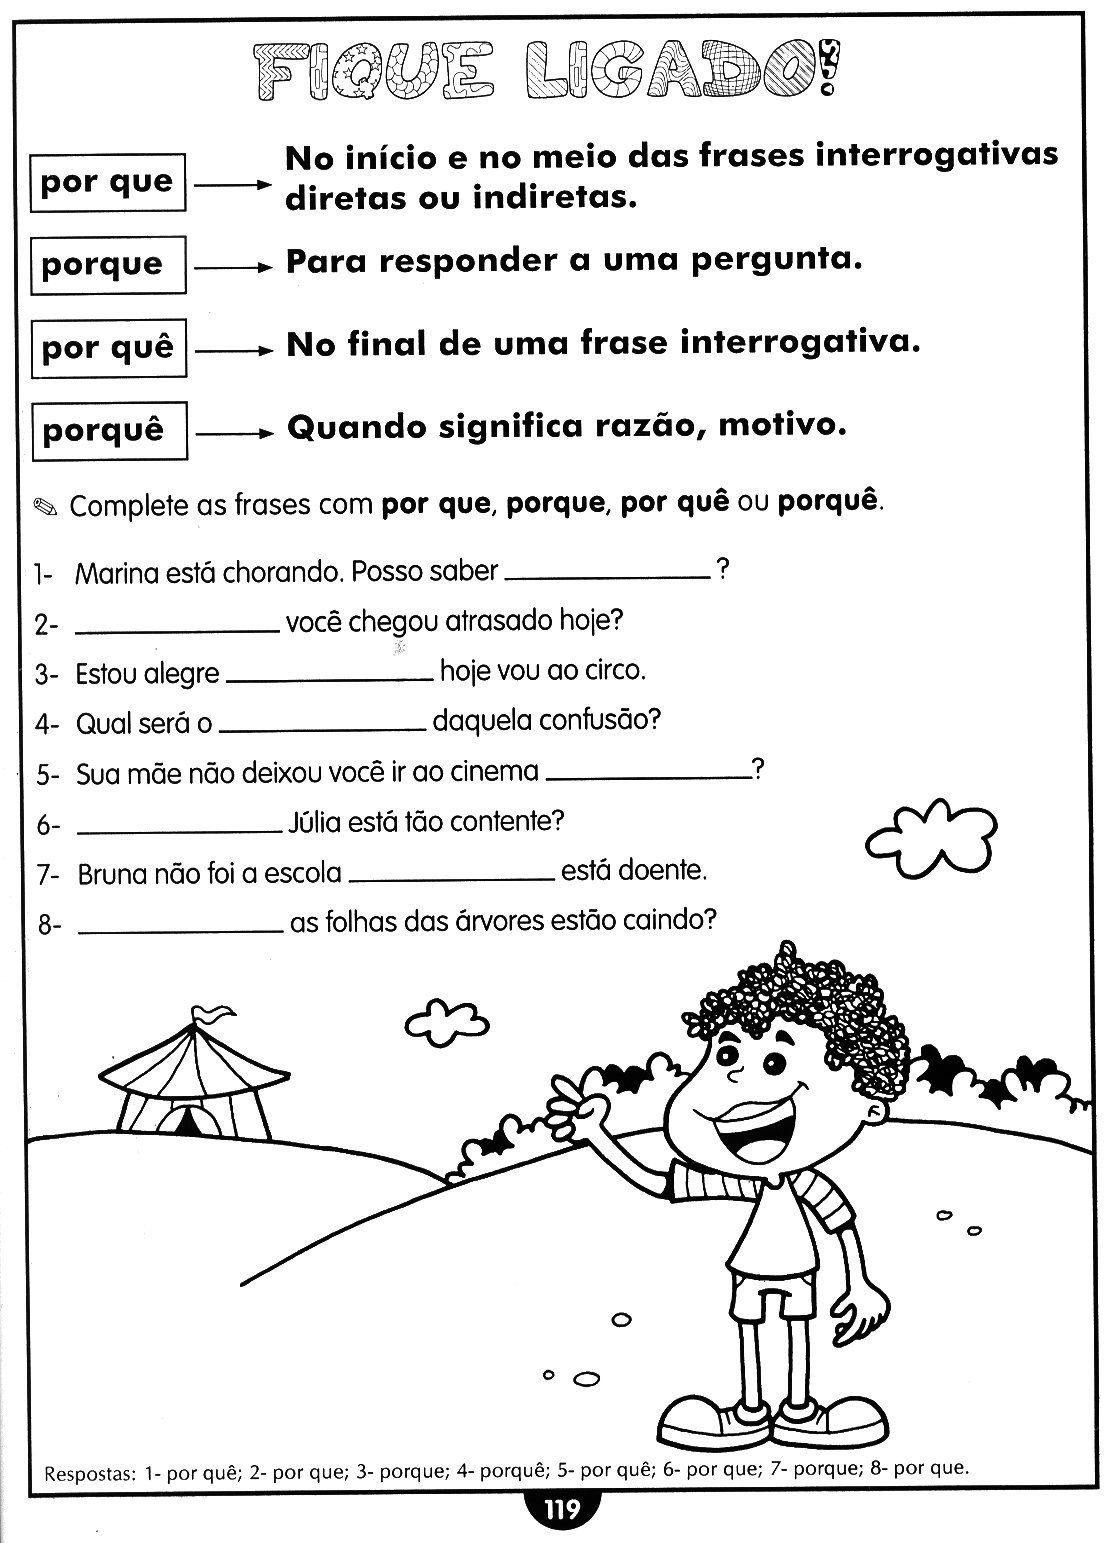 Exame portugues 9 ano 2013